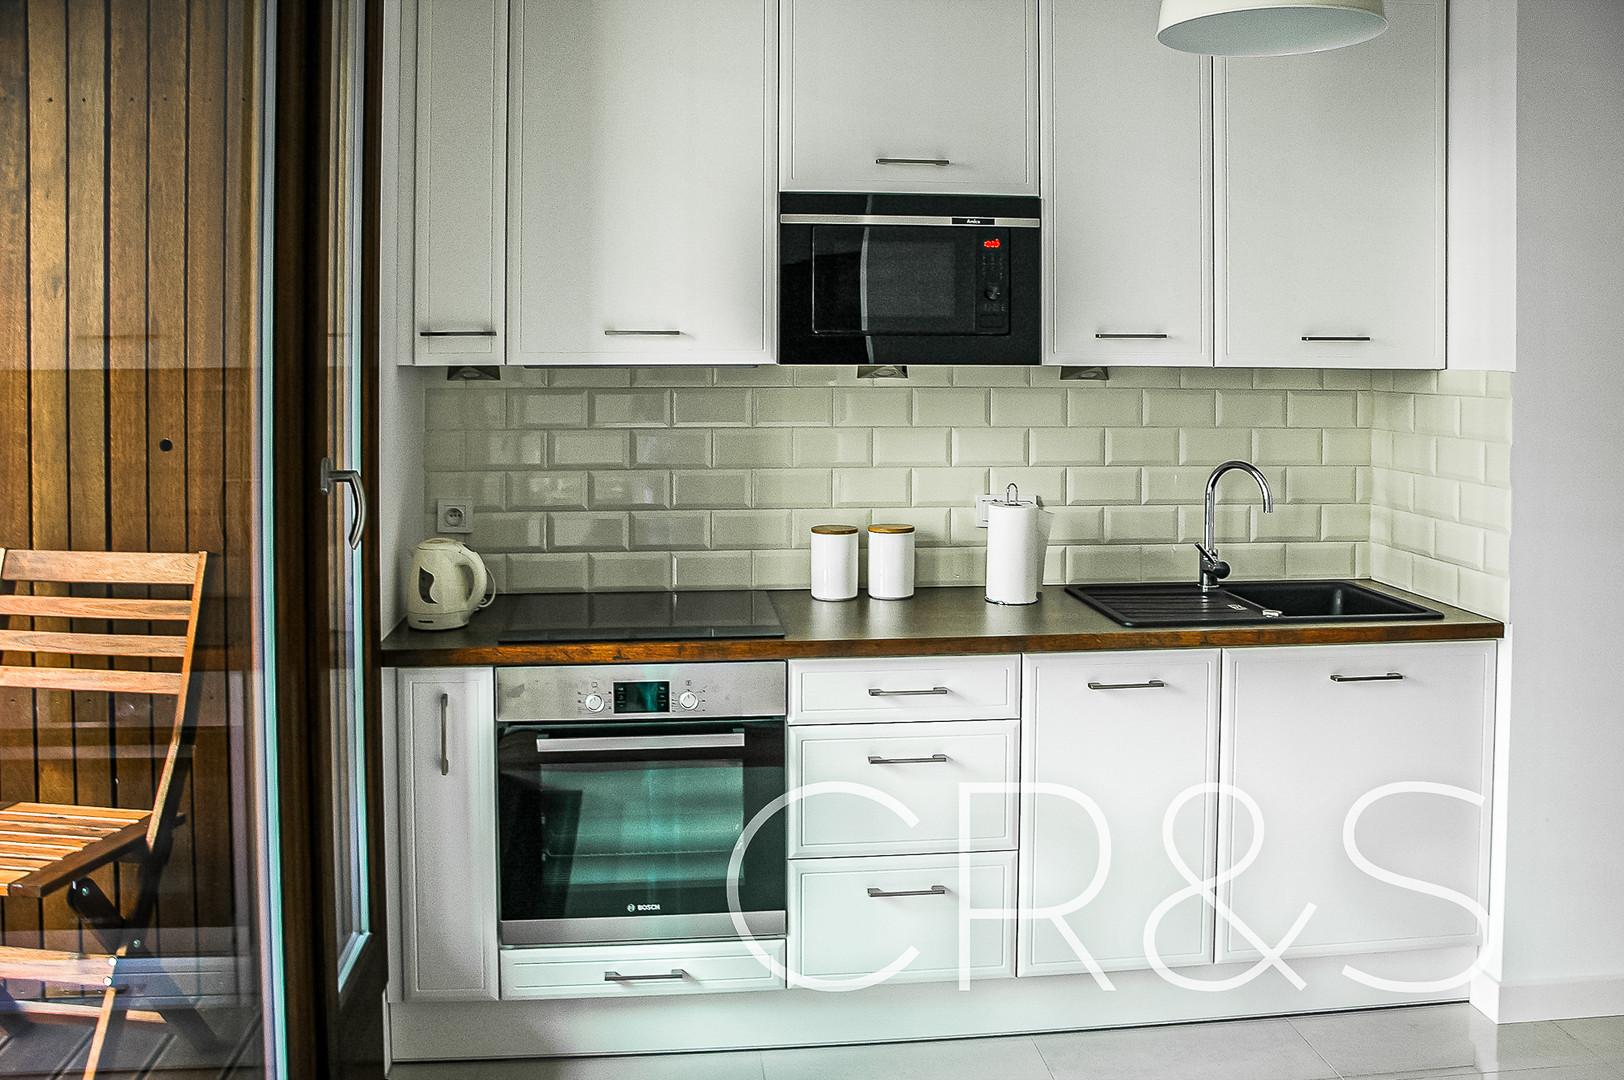 Apartments for rent Kolejowa Warsaw_0882